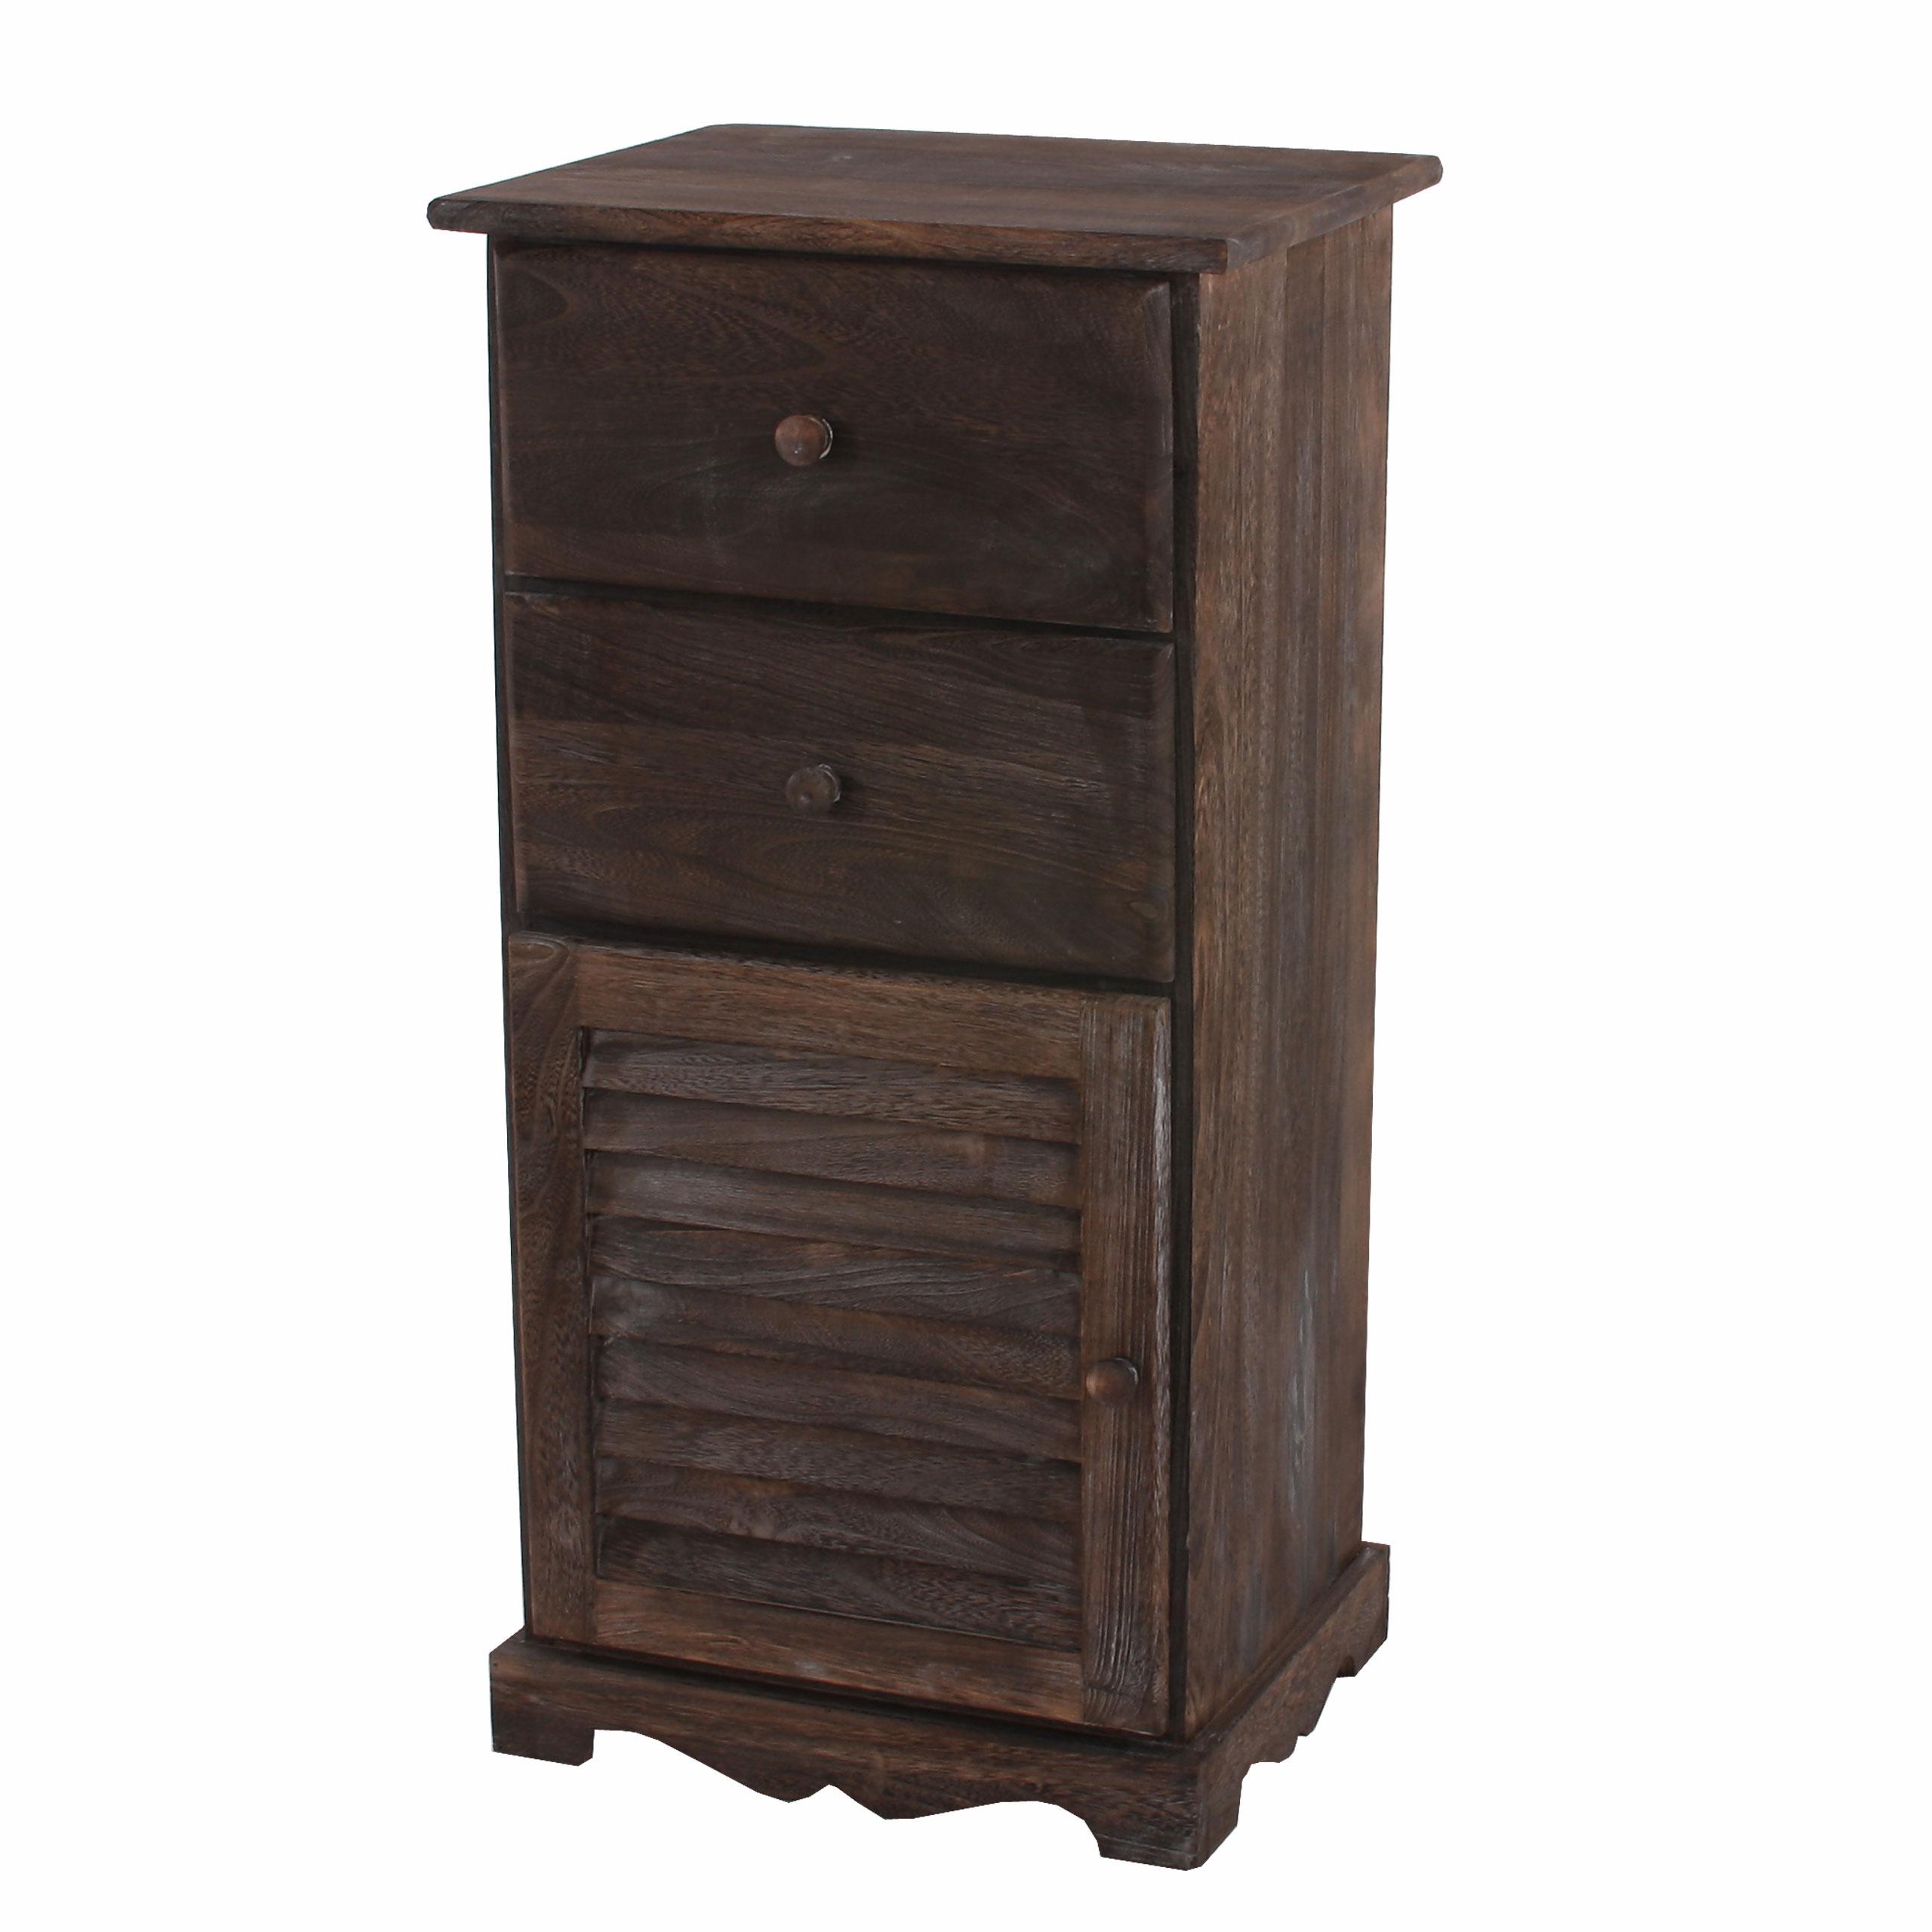 kommode schrank 81x40x32cm shabby look vintage braun wei ebay. Black Bedroom Furniture Sets. Home Design Ideas